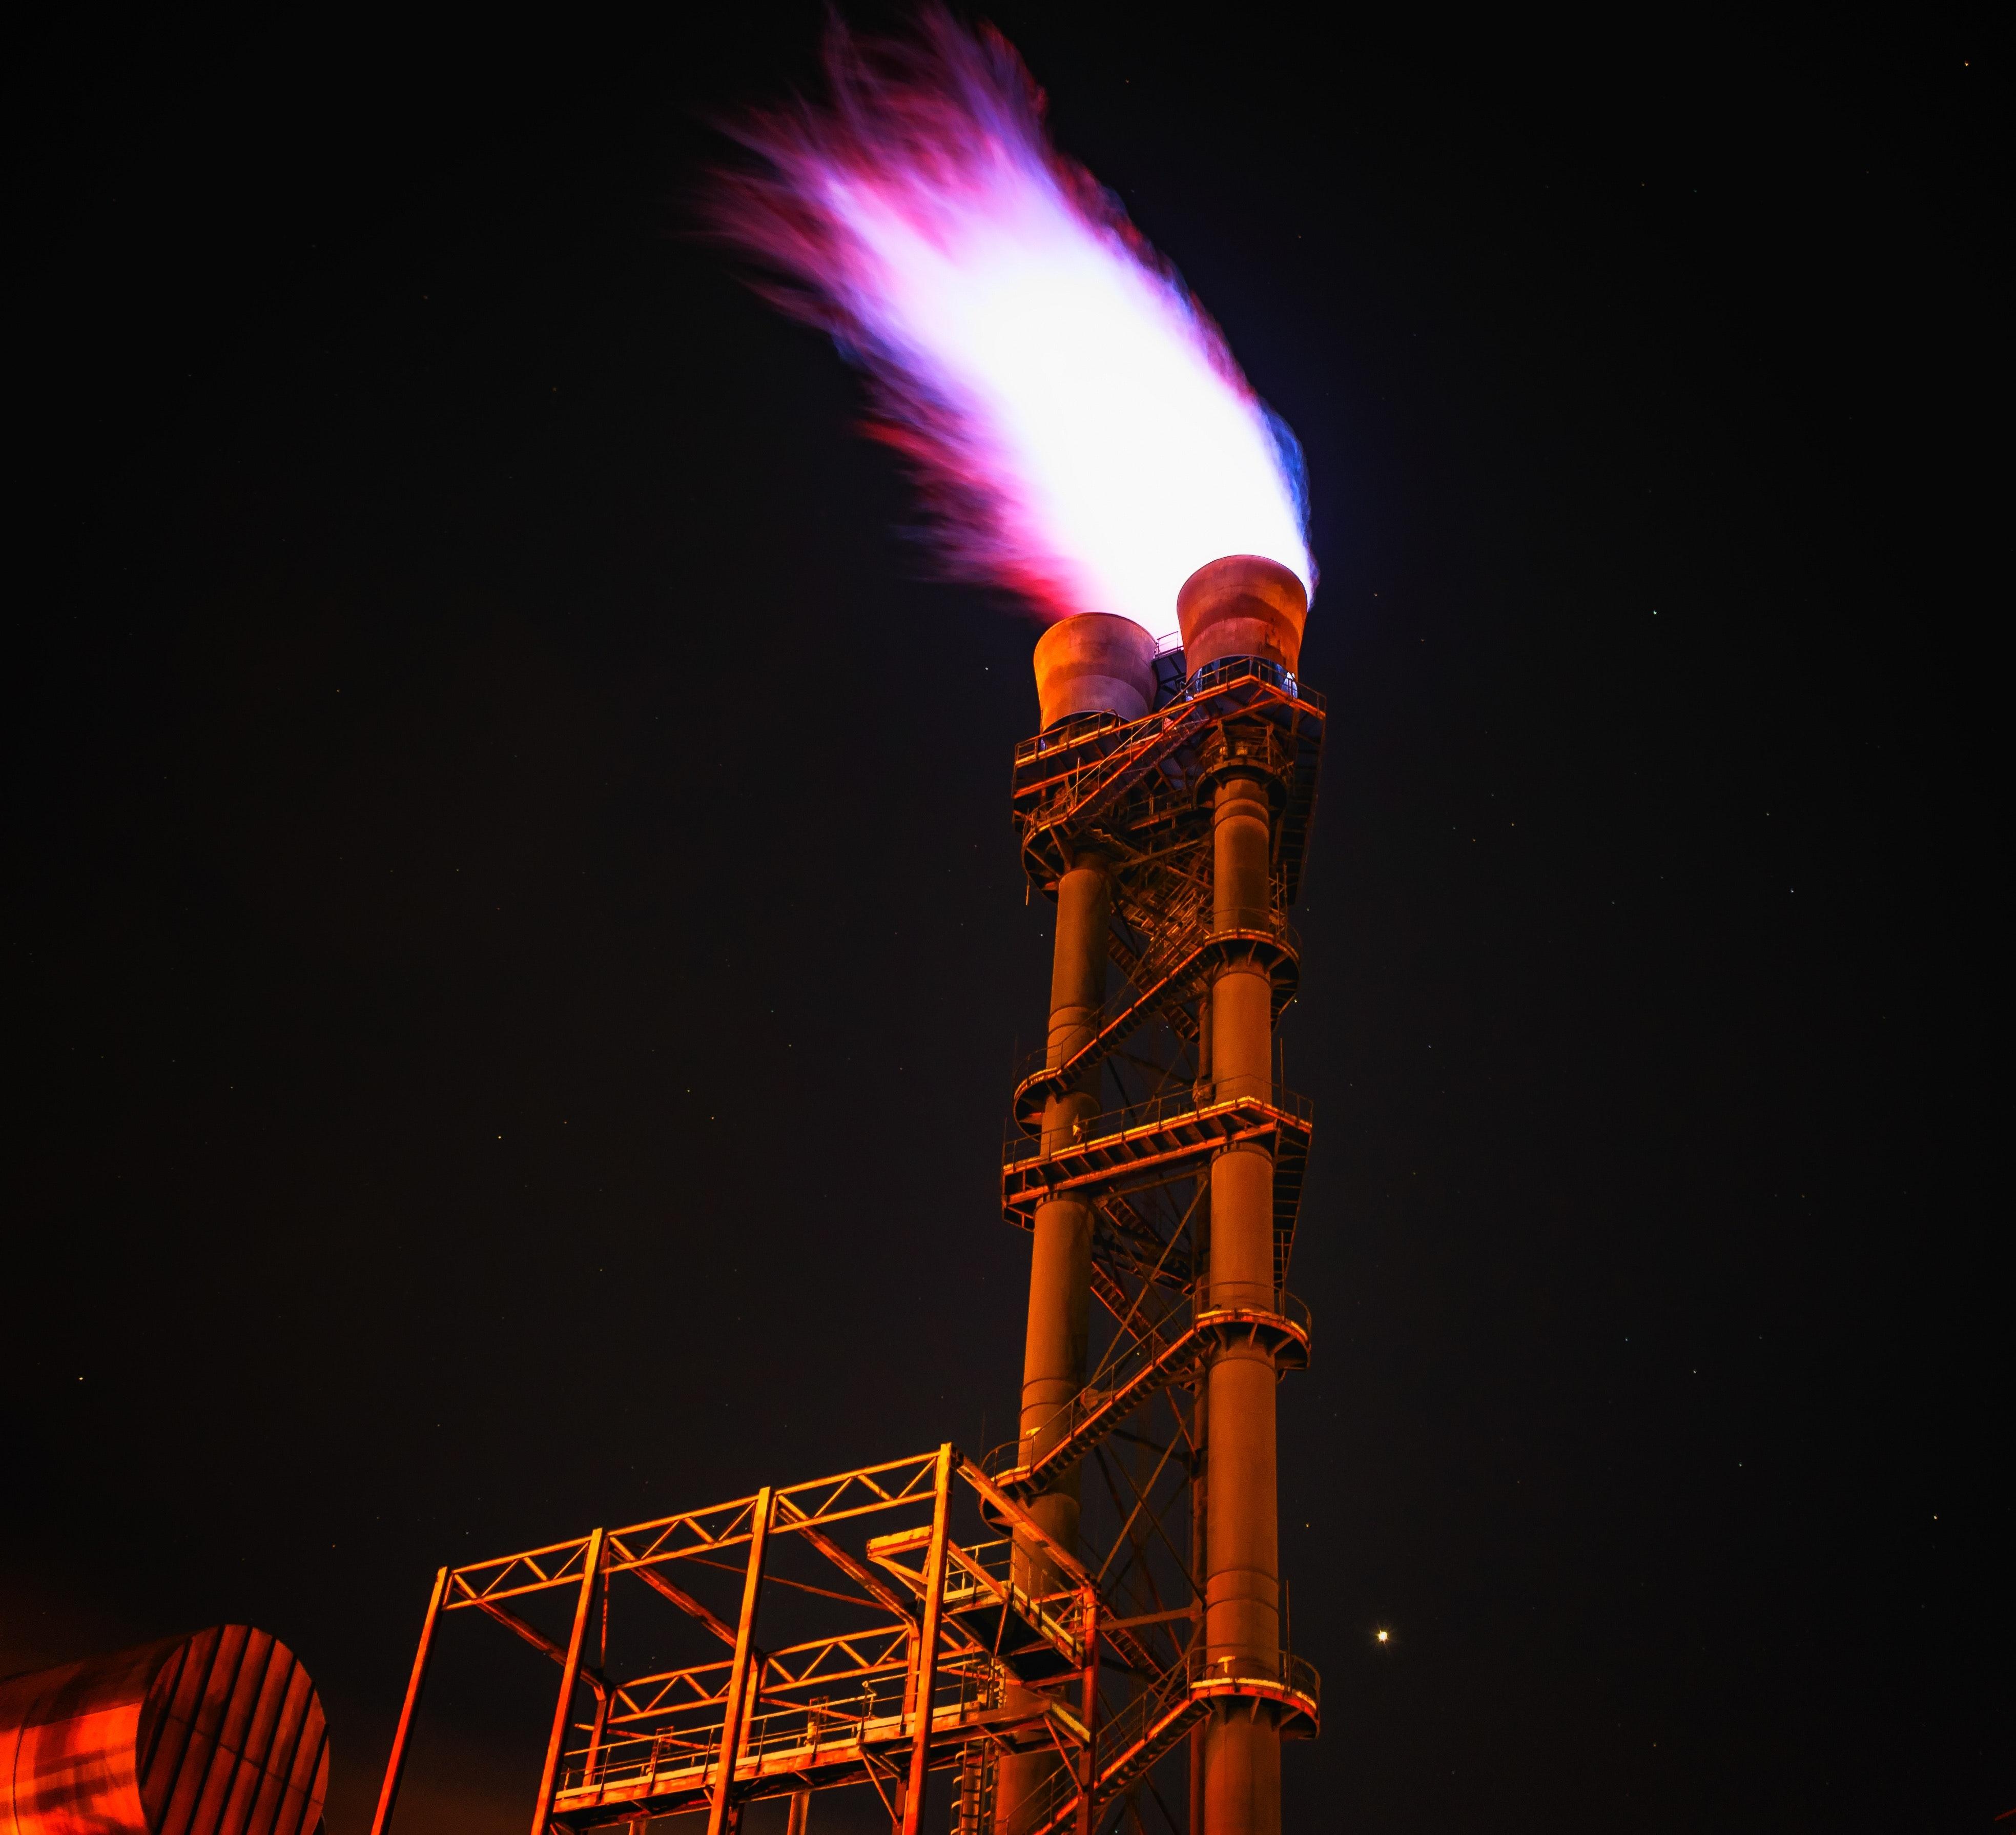 The Oil & Gas Magazine